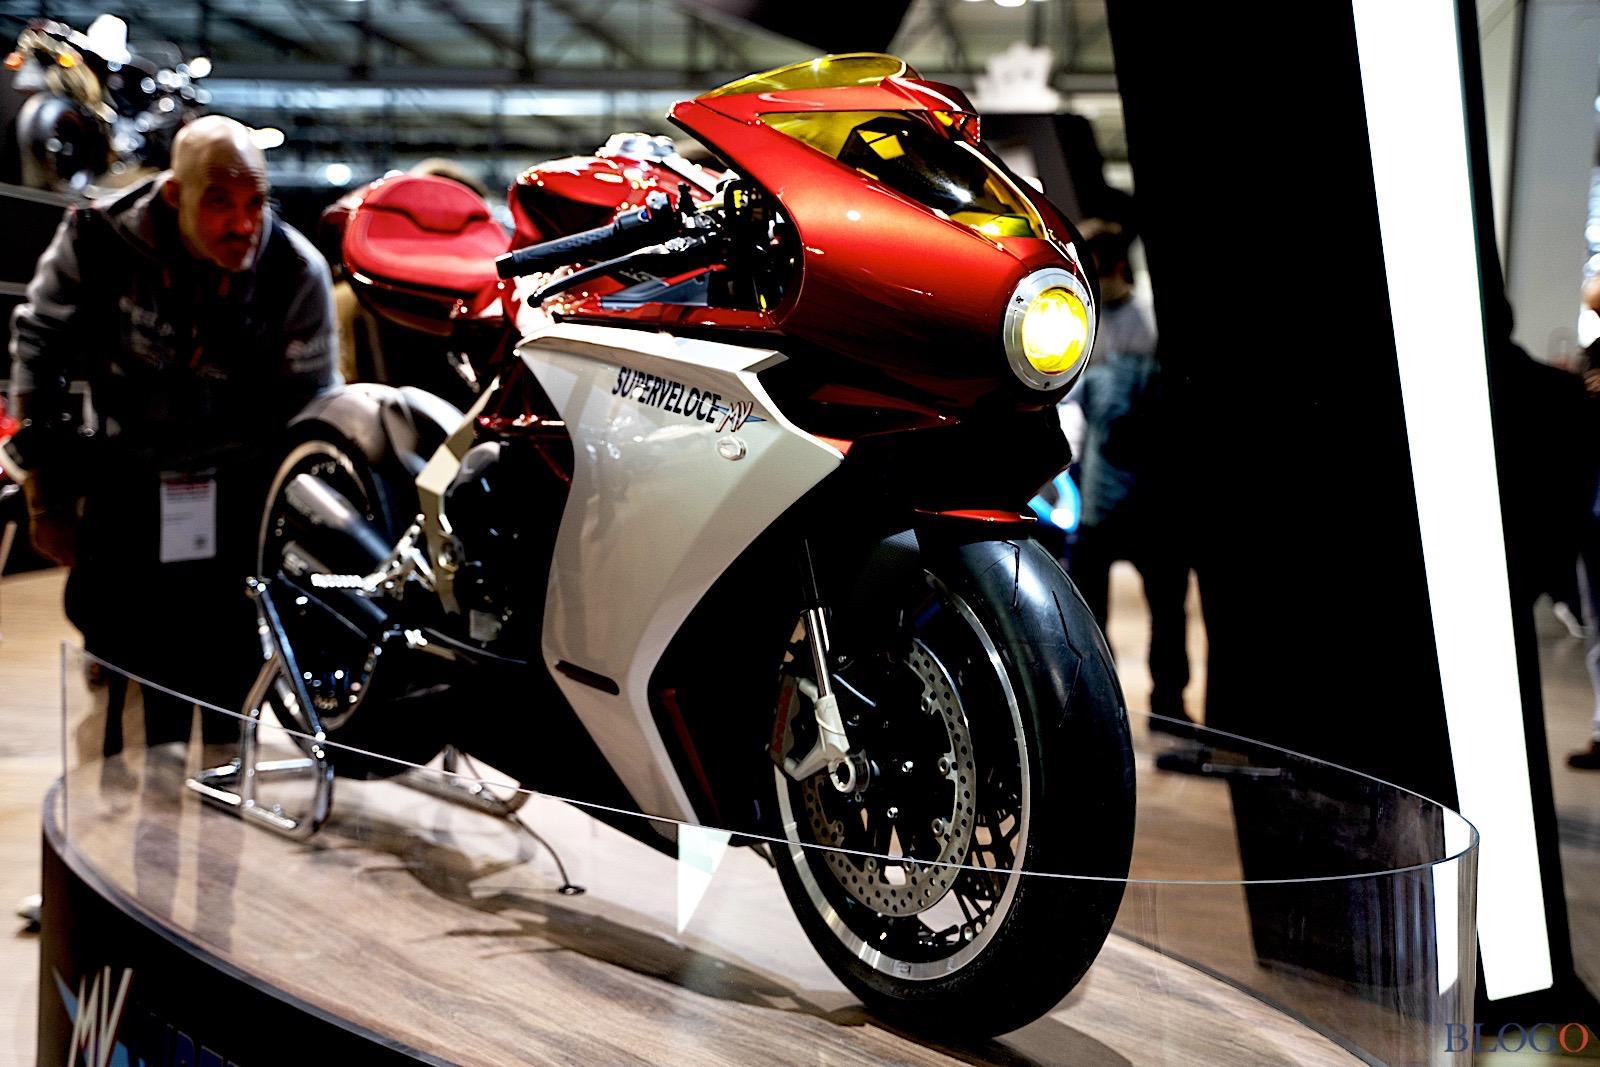 MV Agusta B3 Nova ??? ?? Moto Corse - mv agusta brutale 800